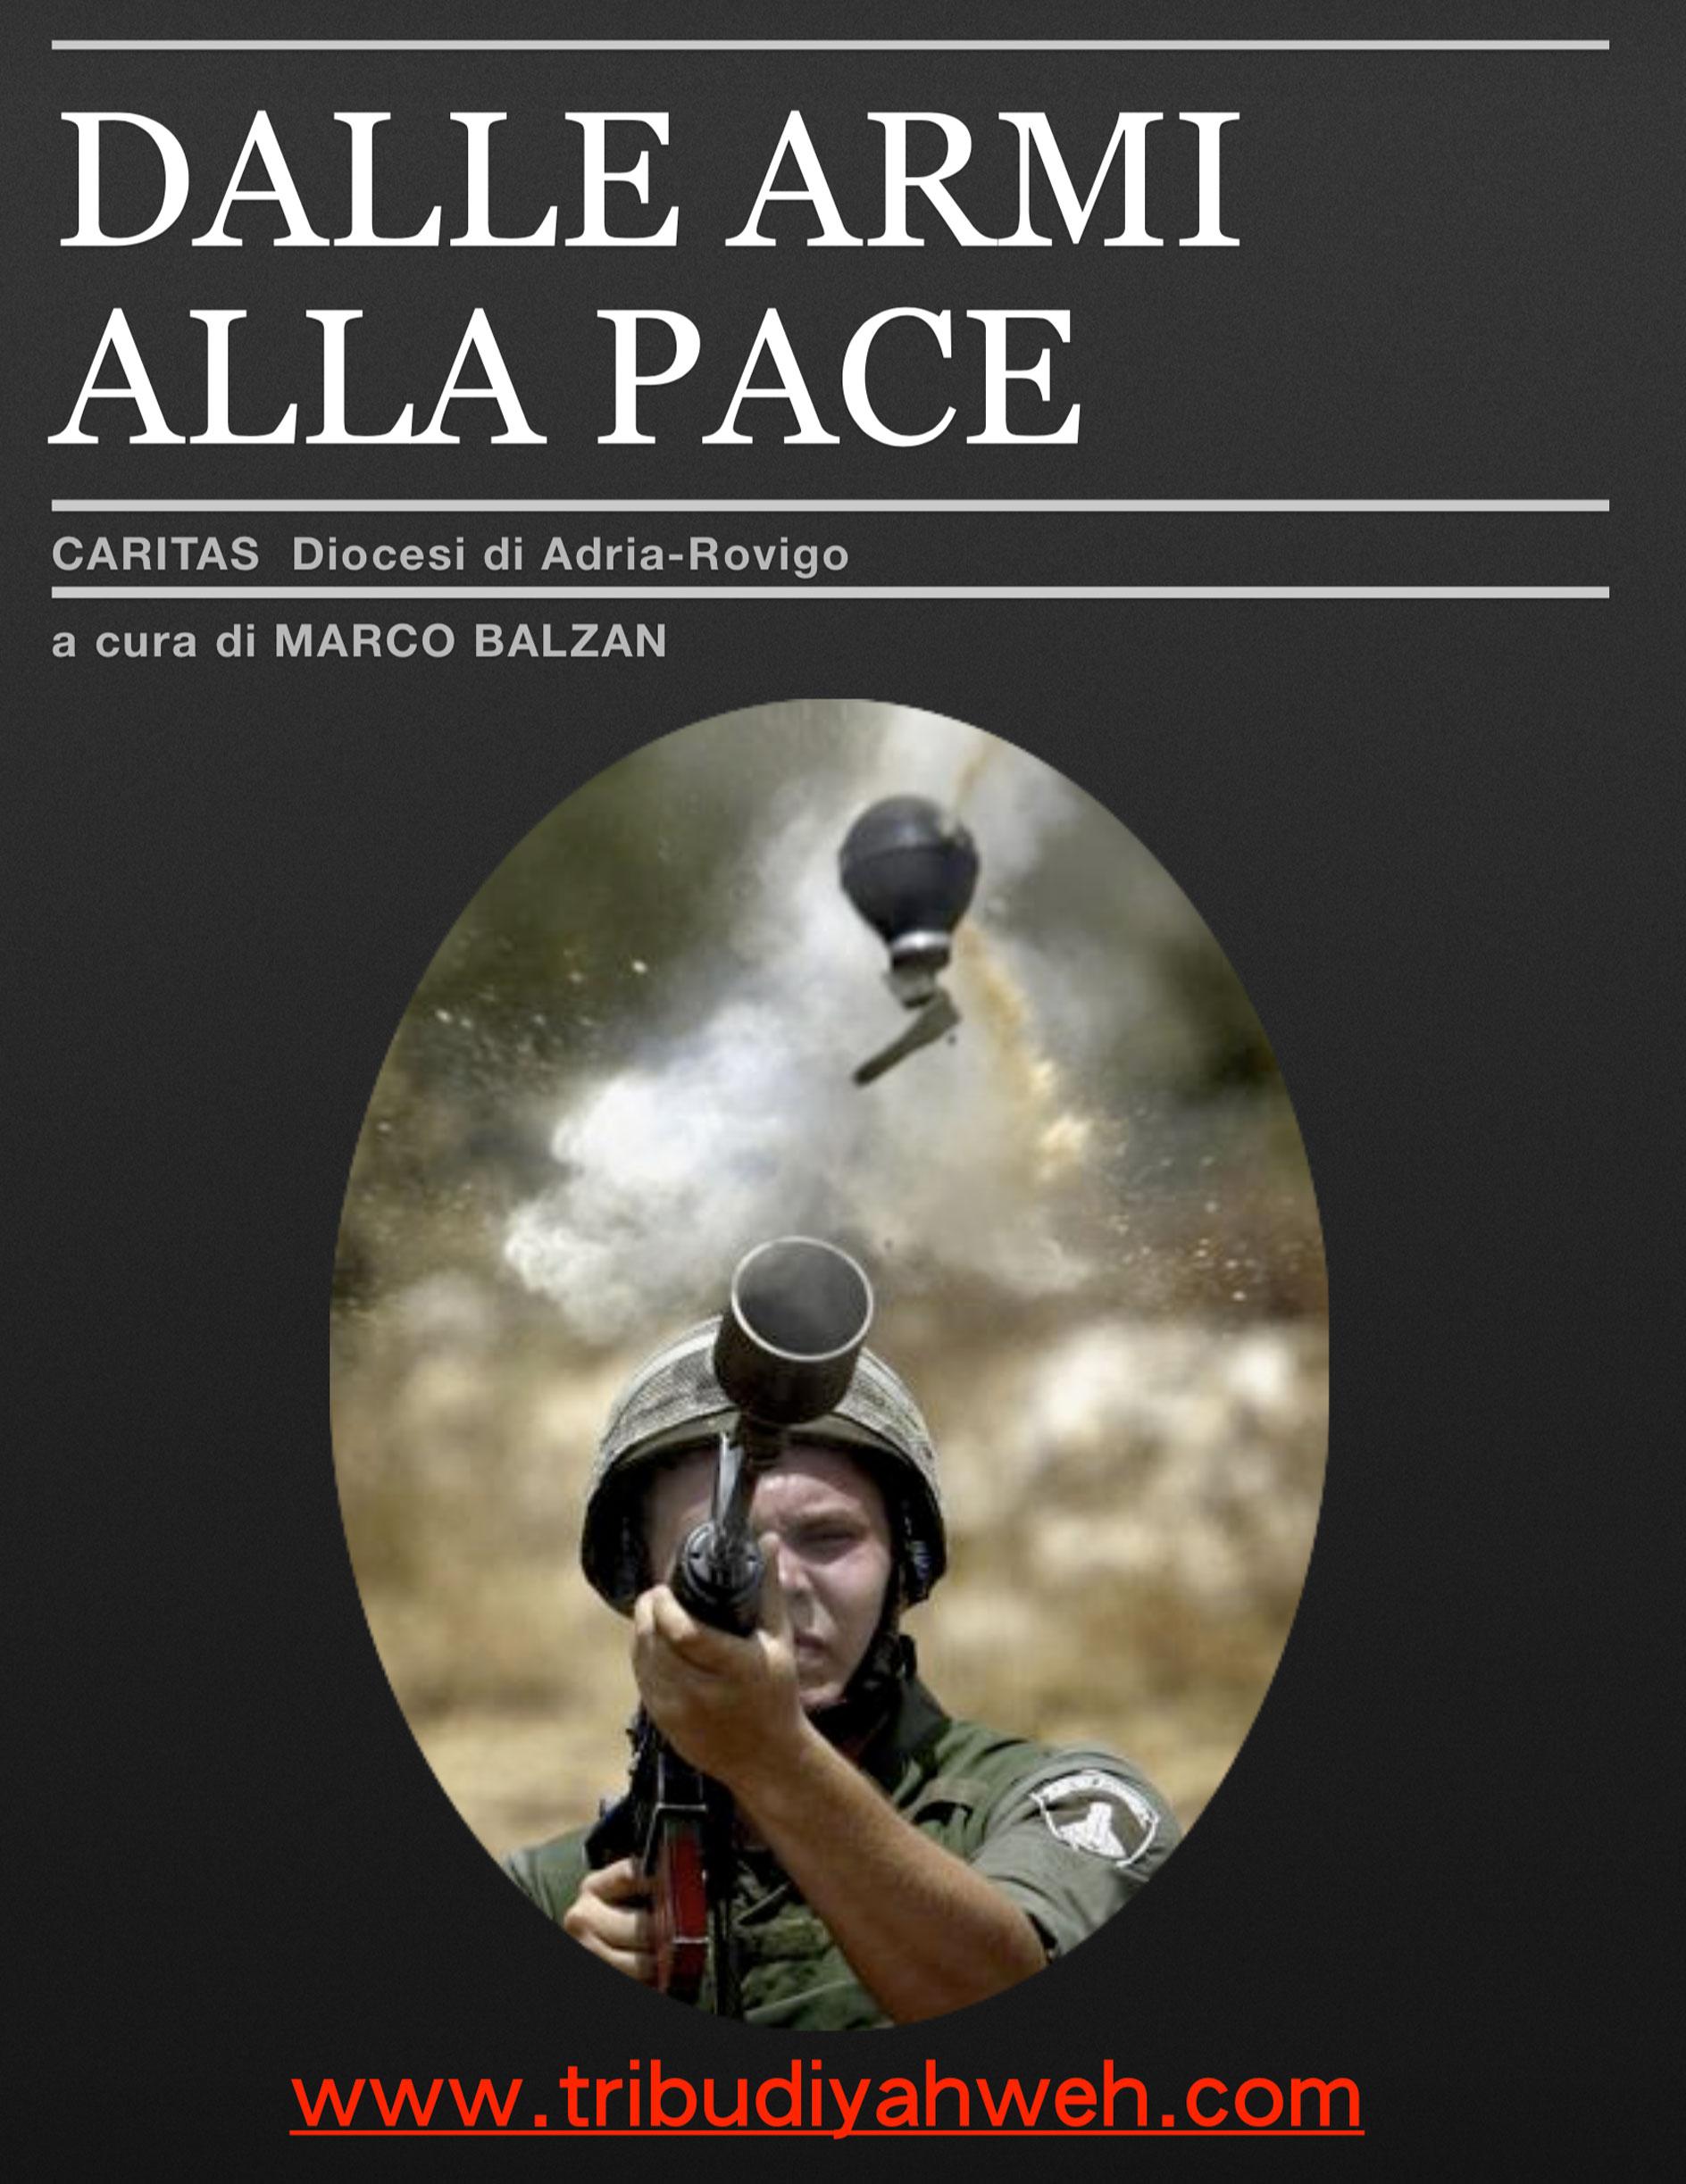 https://www.tribudiyahweh.com/wp/wp-content/uploads/2019/03/dalle-armi-alla-pace.jpg